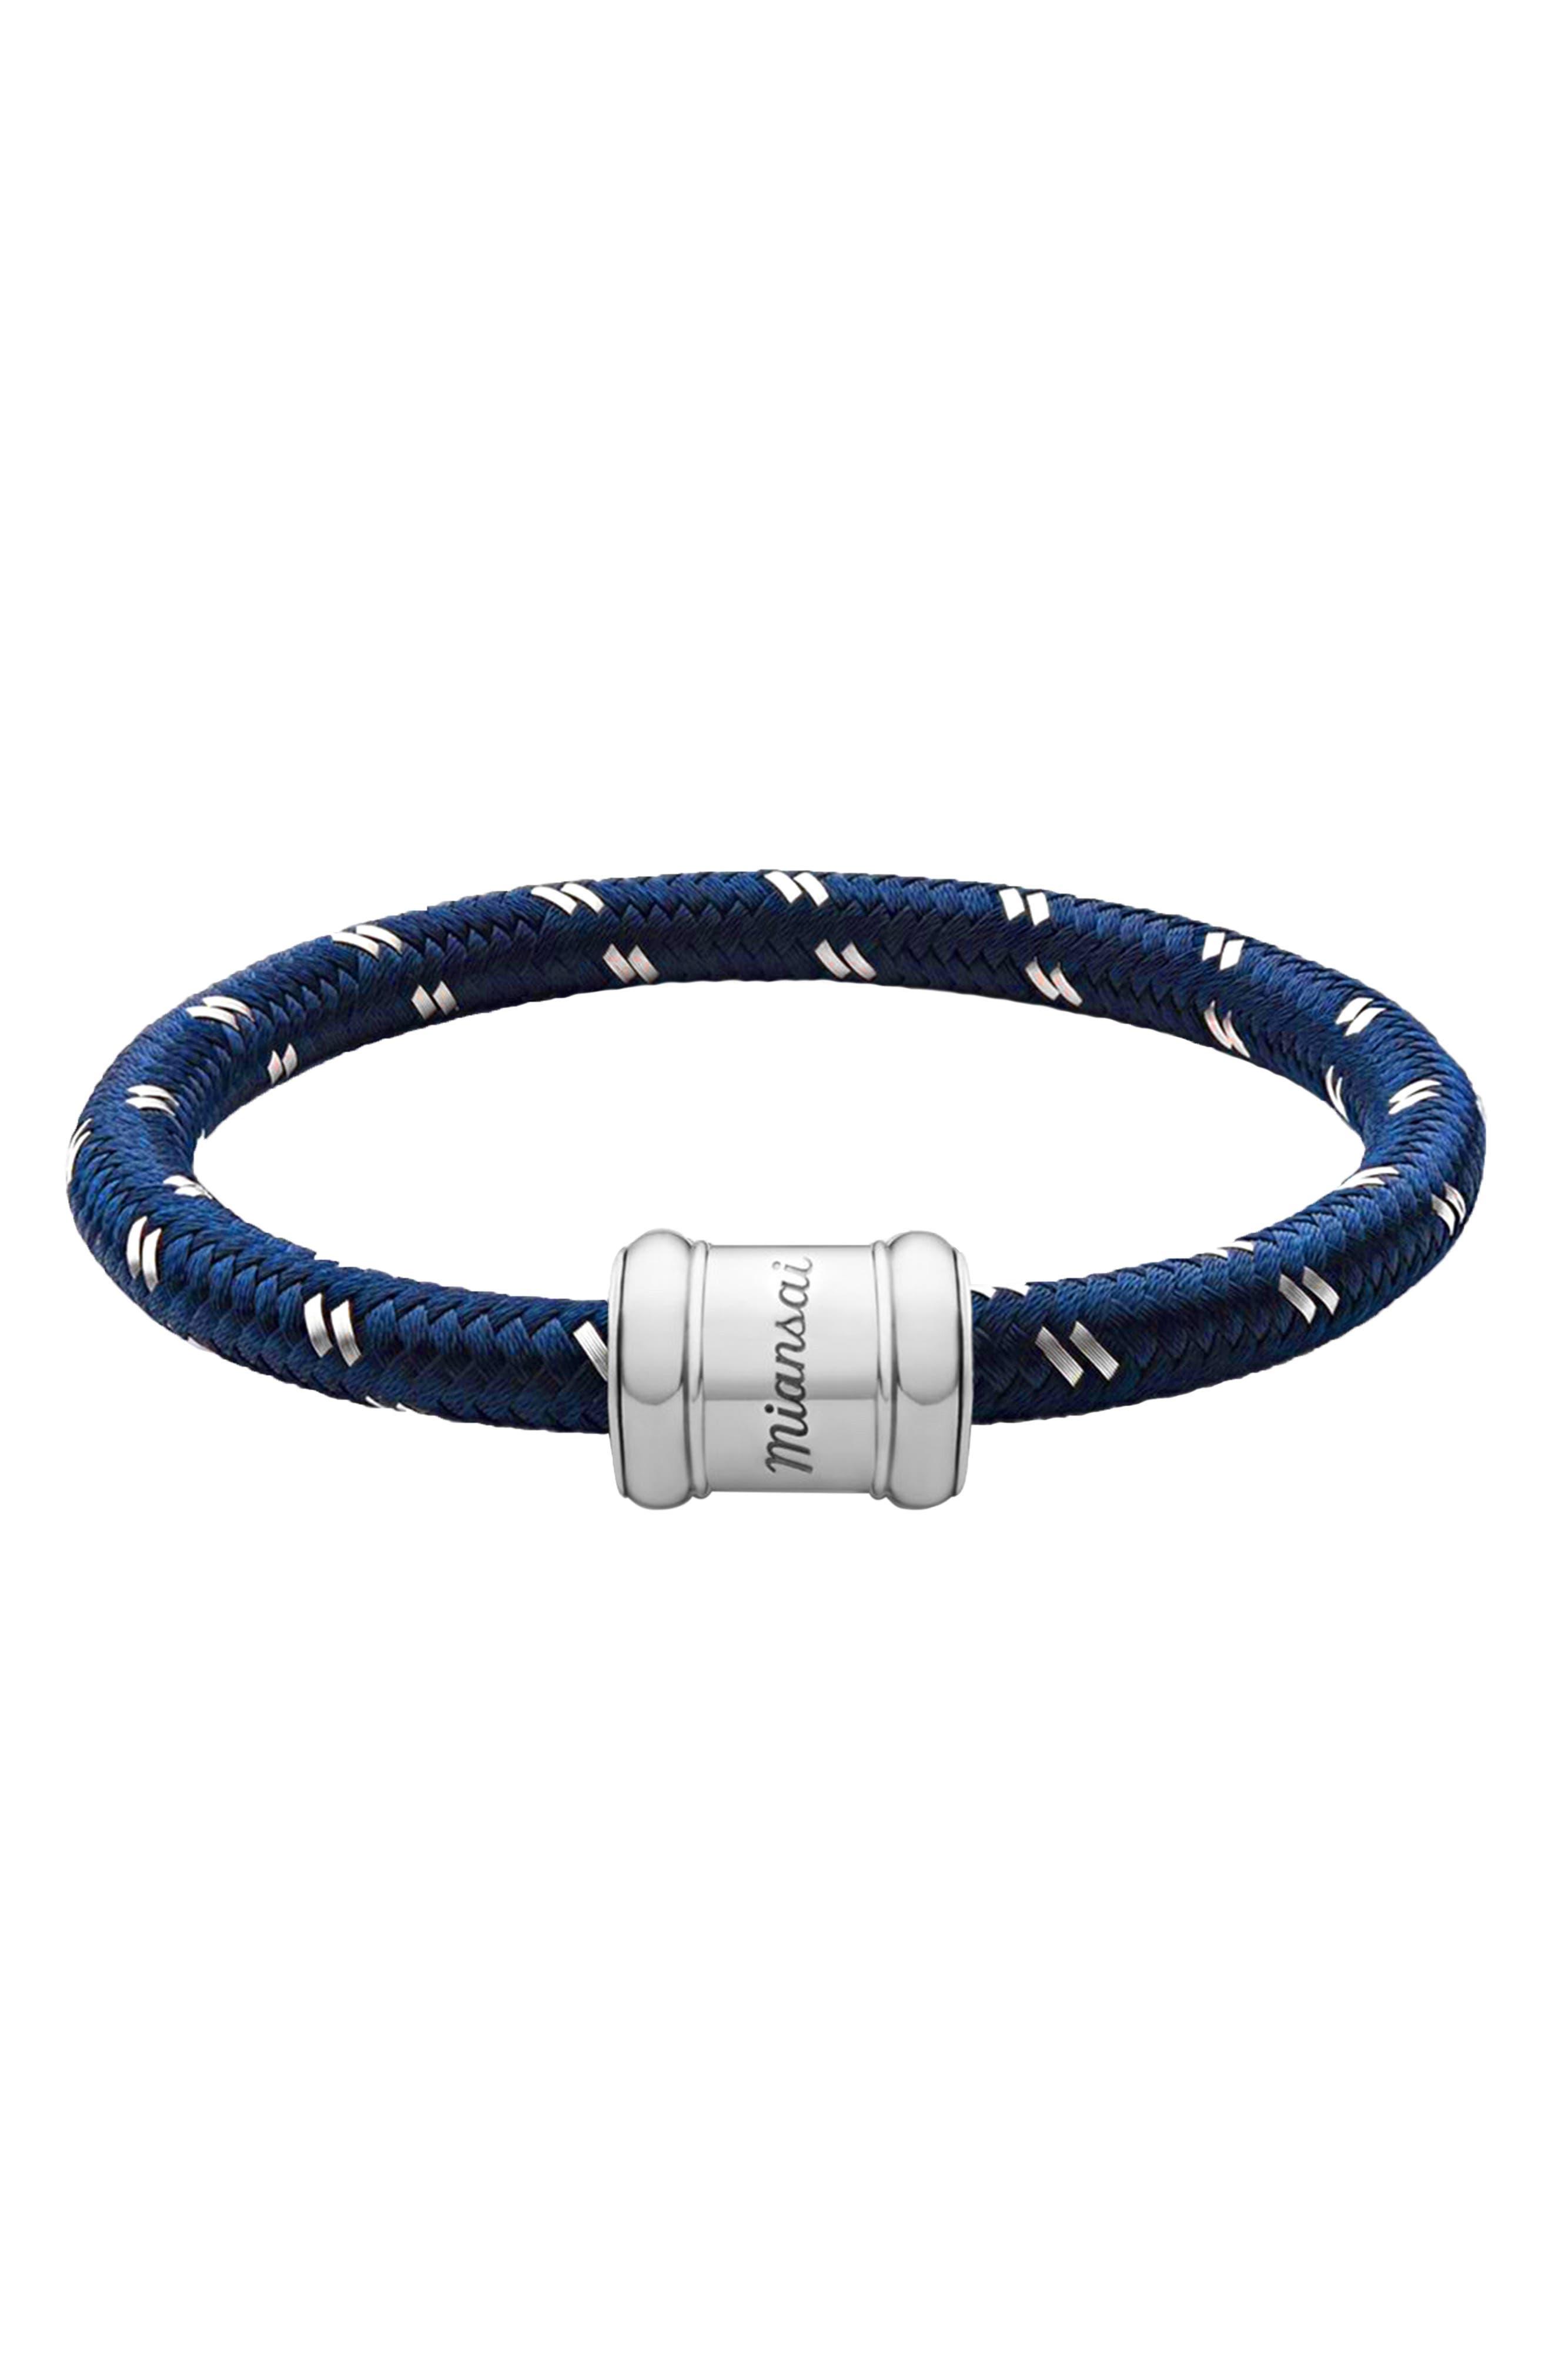 Barrel Casing Nylon Woven Bracelet,                         Main,                         color, SENECA